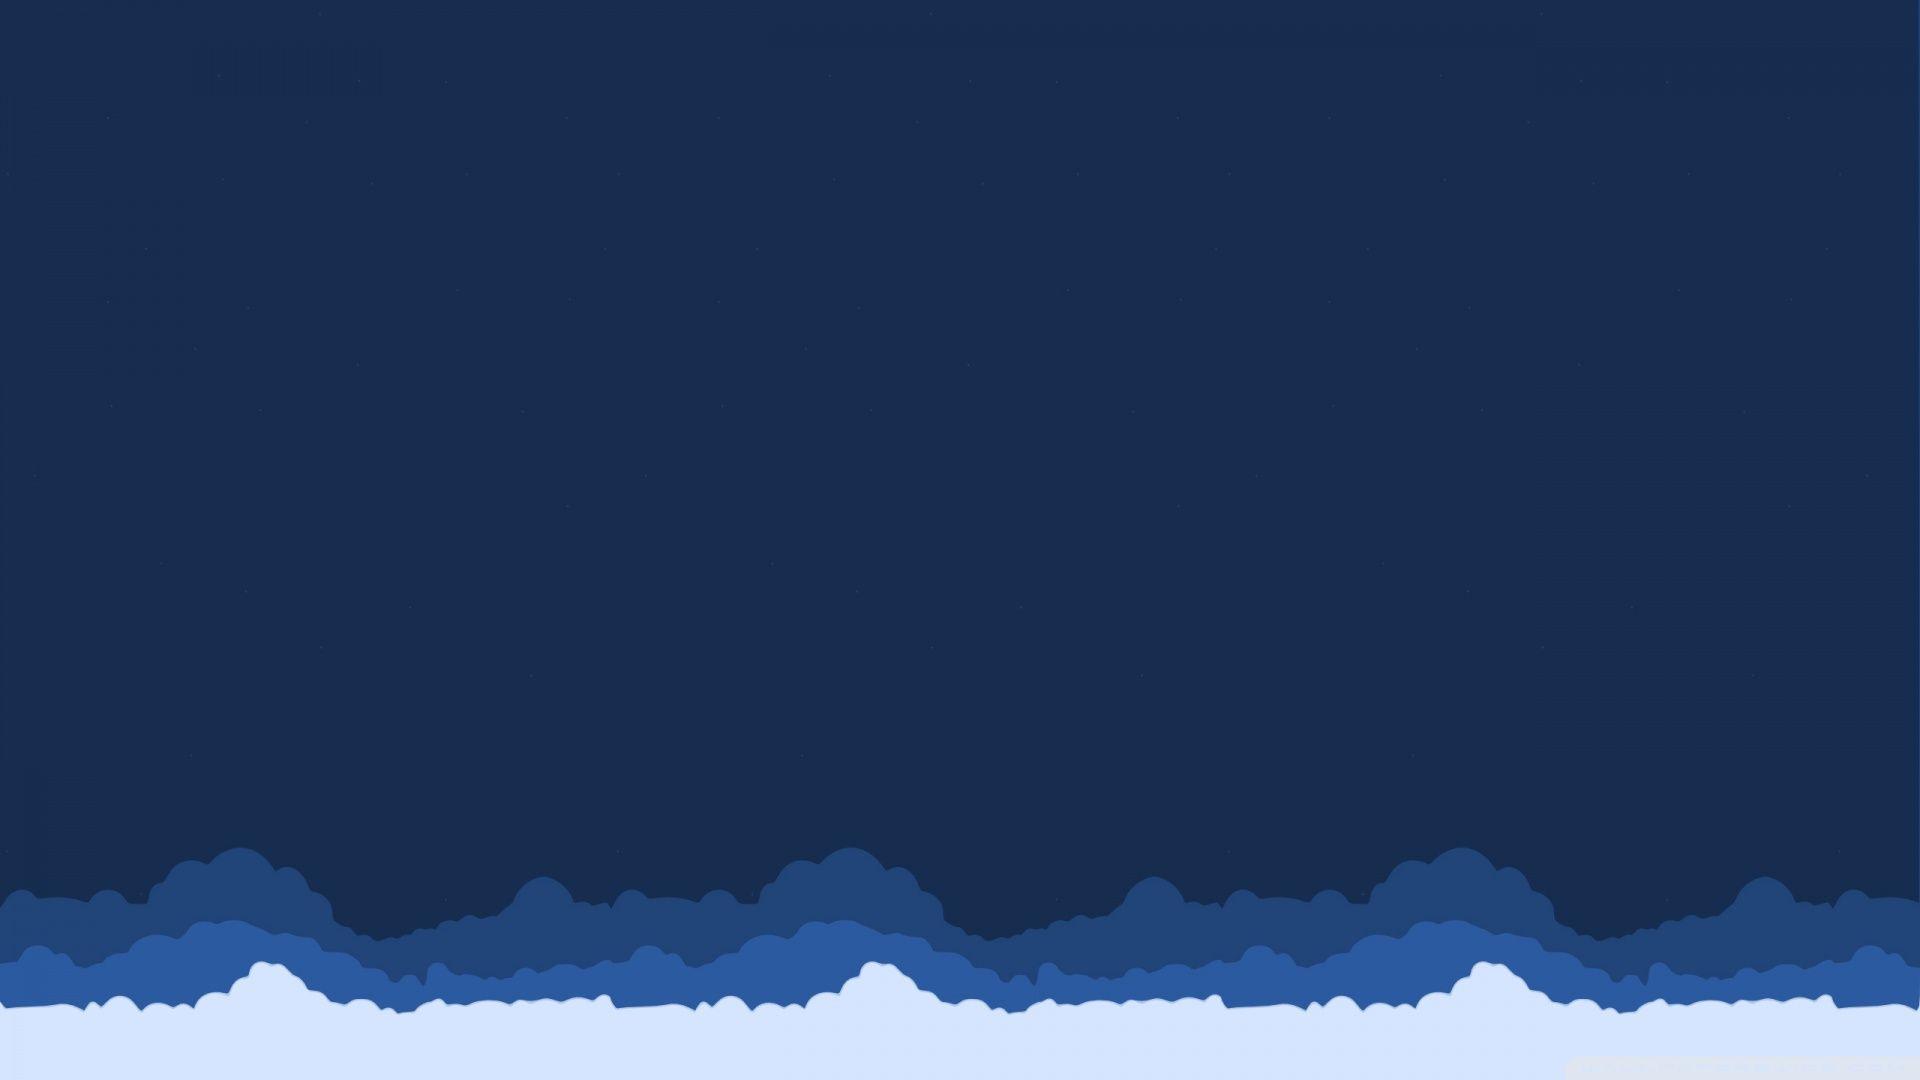 Aesthetic Clouds Desktop Wallpapers Top Free Aesthetic Clouds